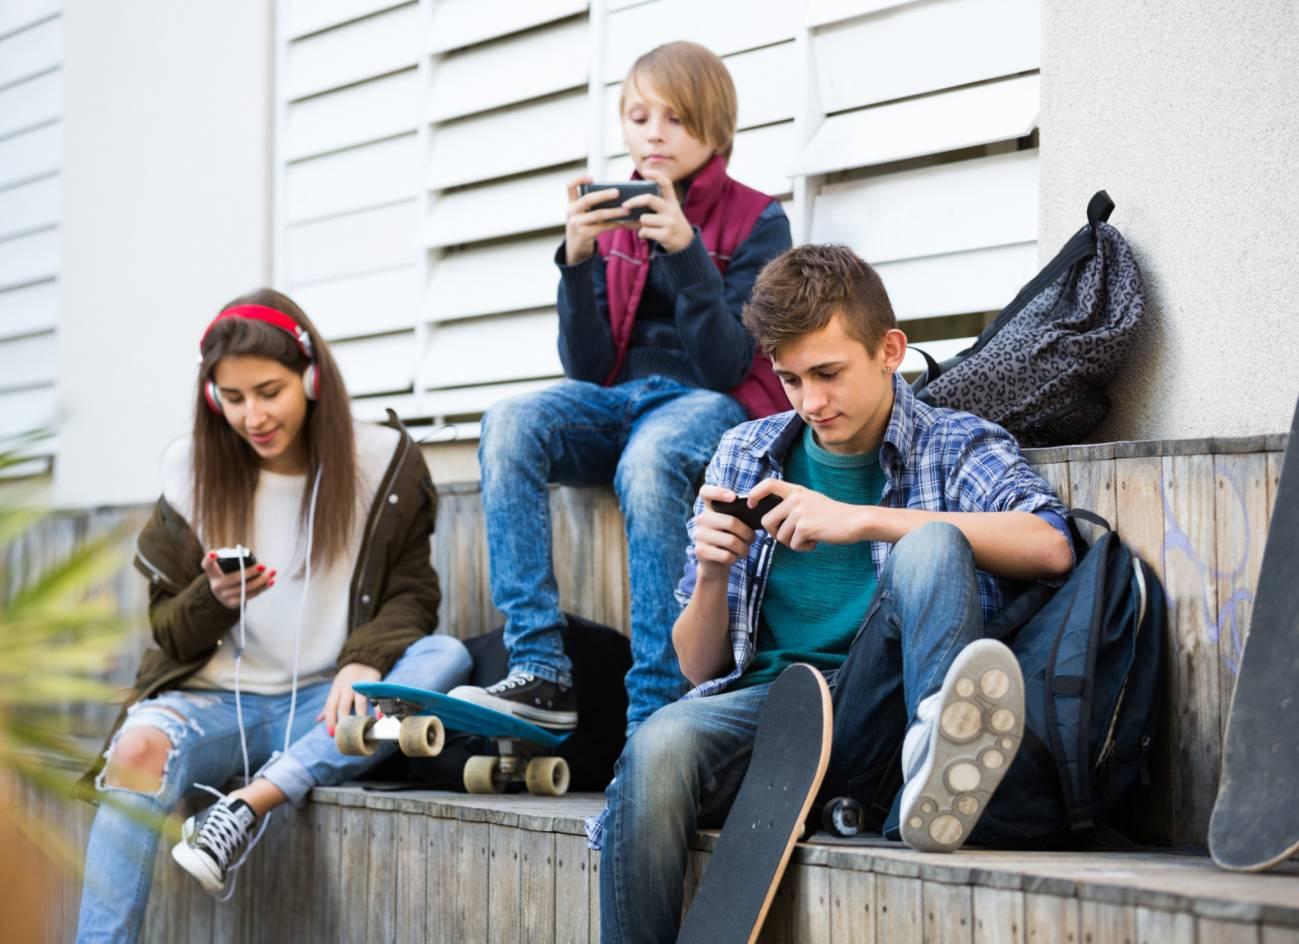 Adolescentes con propósito